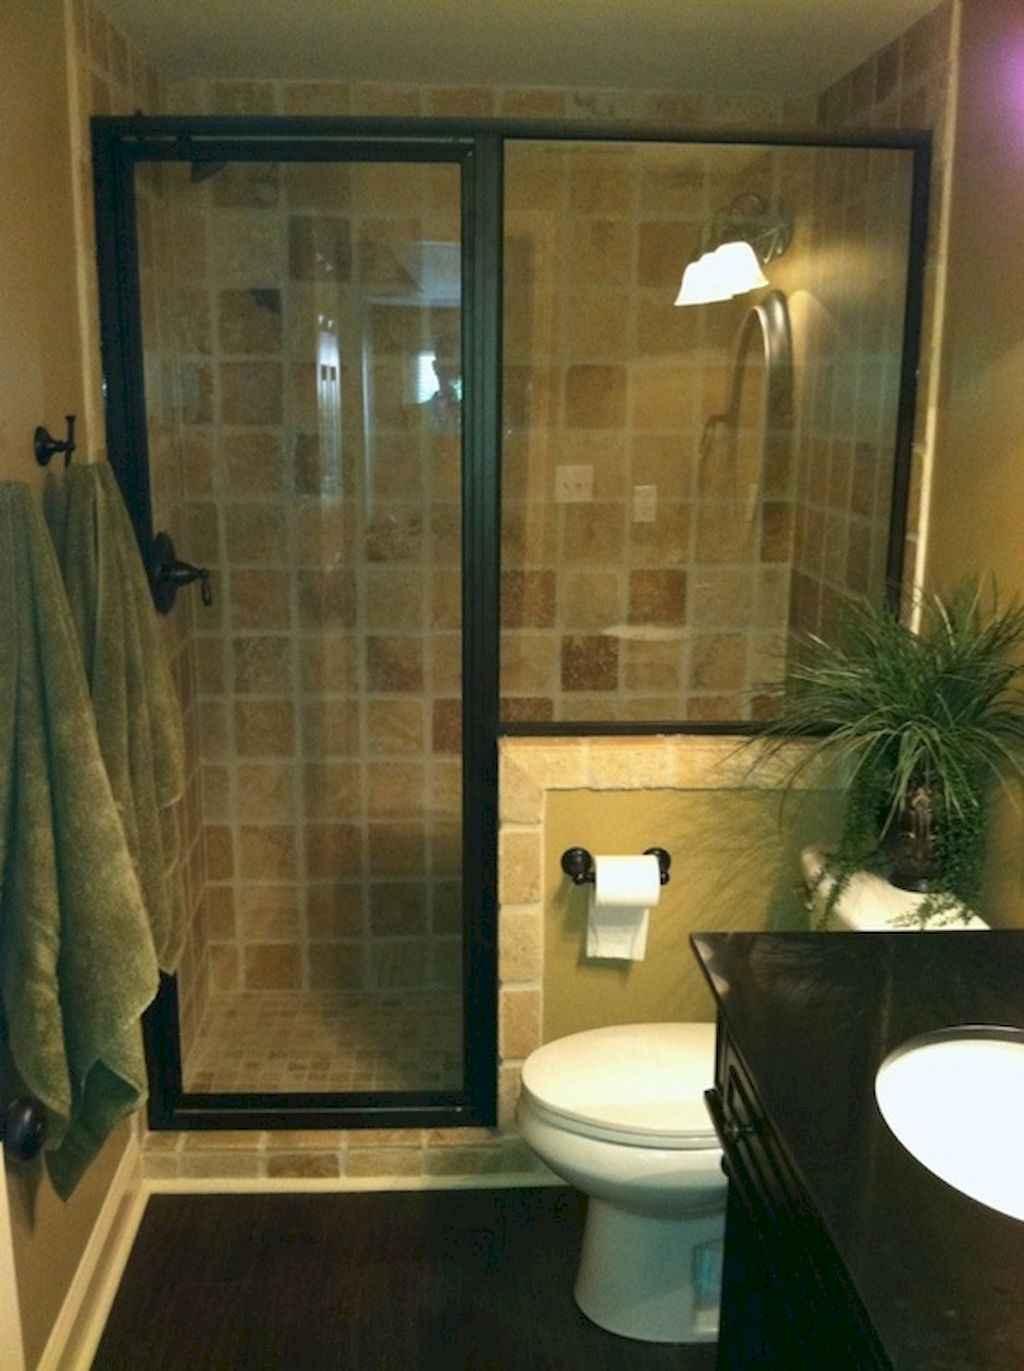 Inspiring apartment bathroom remodel ideas on a budget (15)